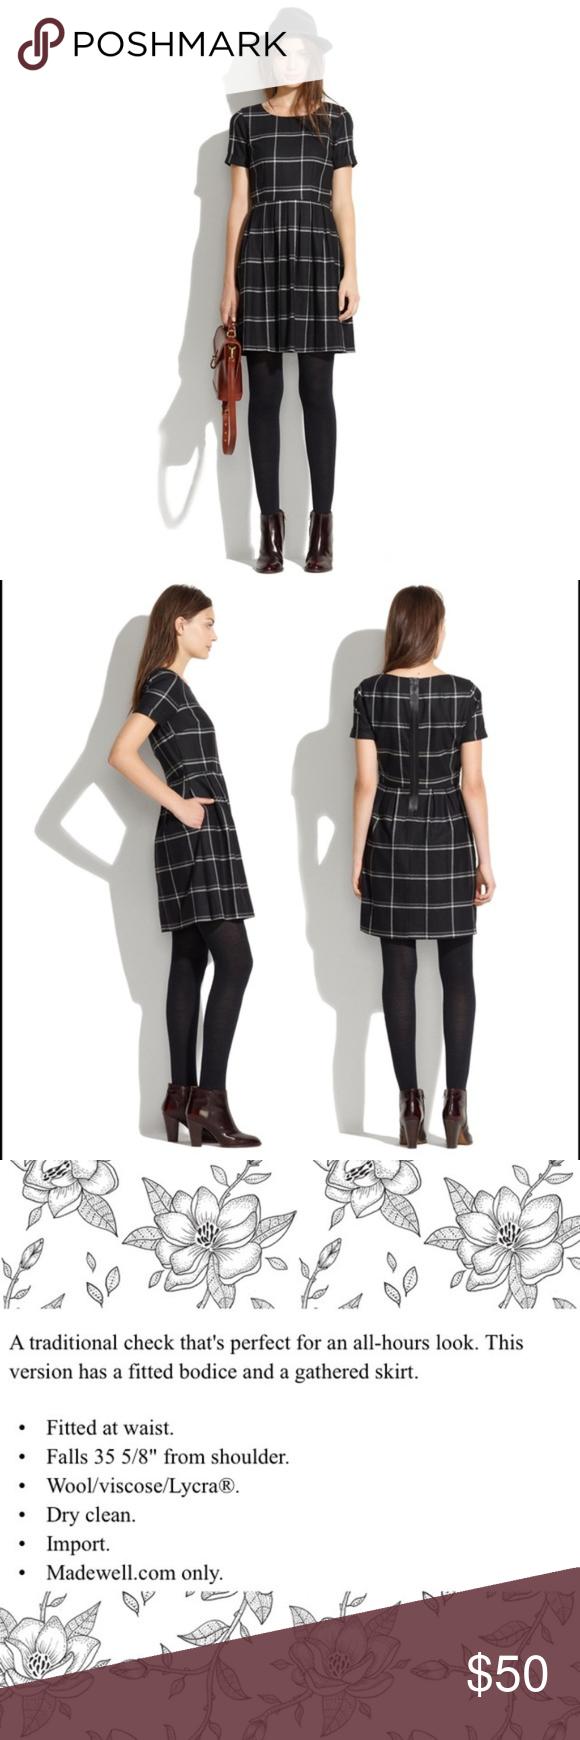 c0e3f18c223 Madewell Windowpane black white check Twirl dress Lovely